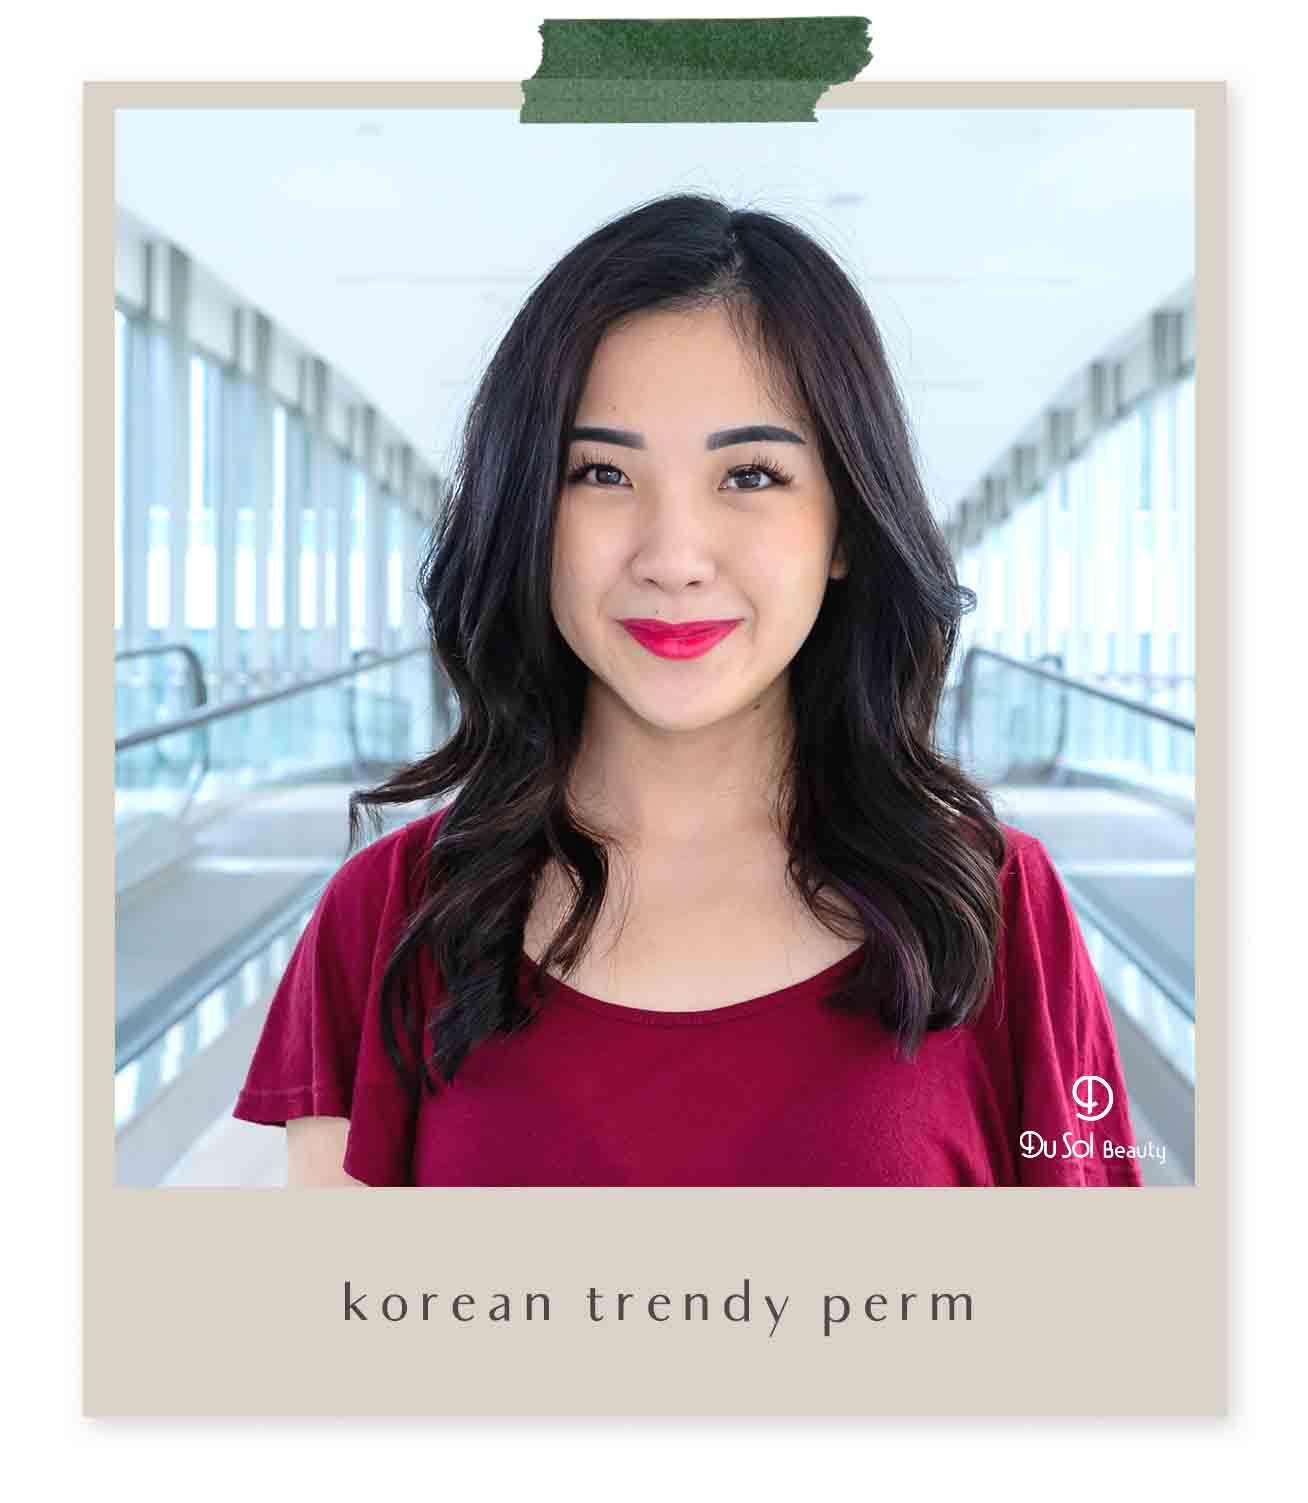 Korean Trendy Perm (S-Curl)